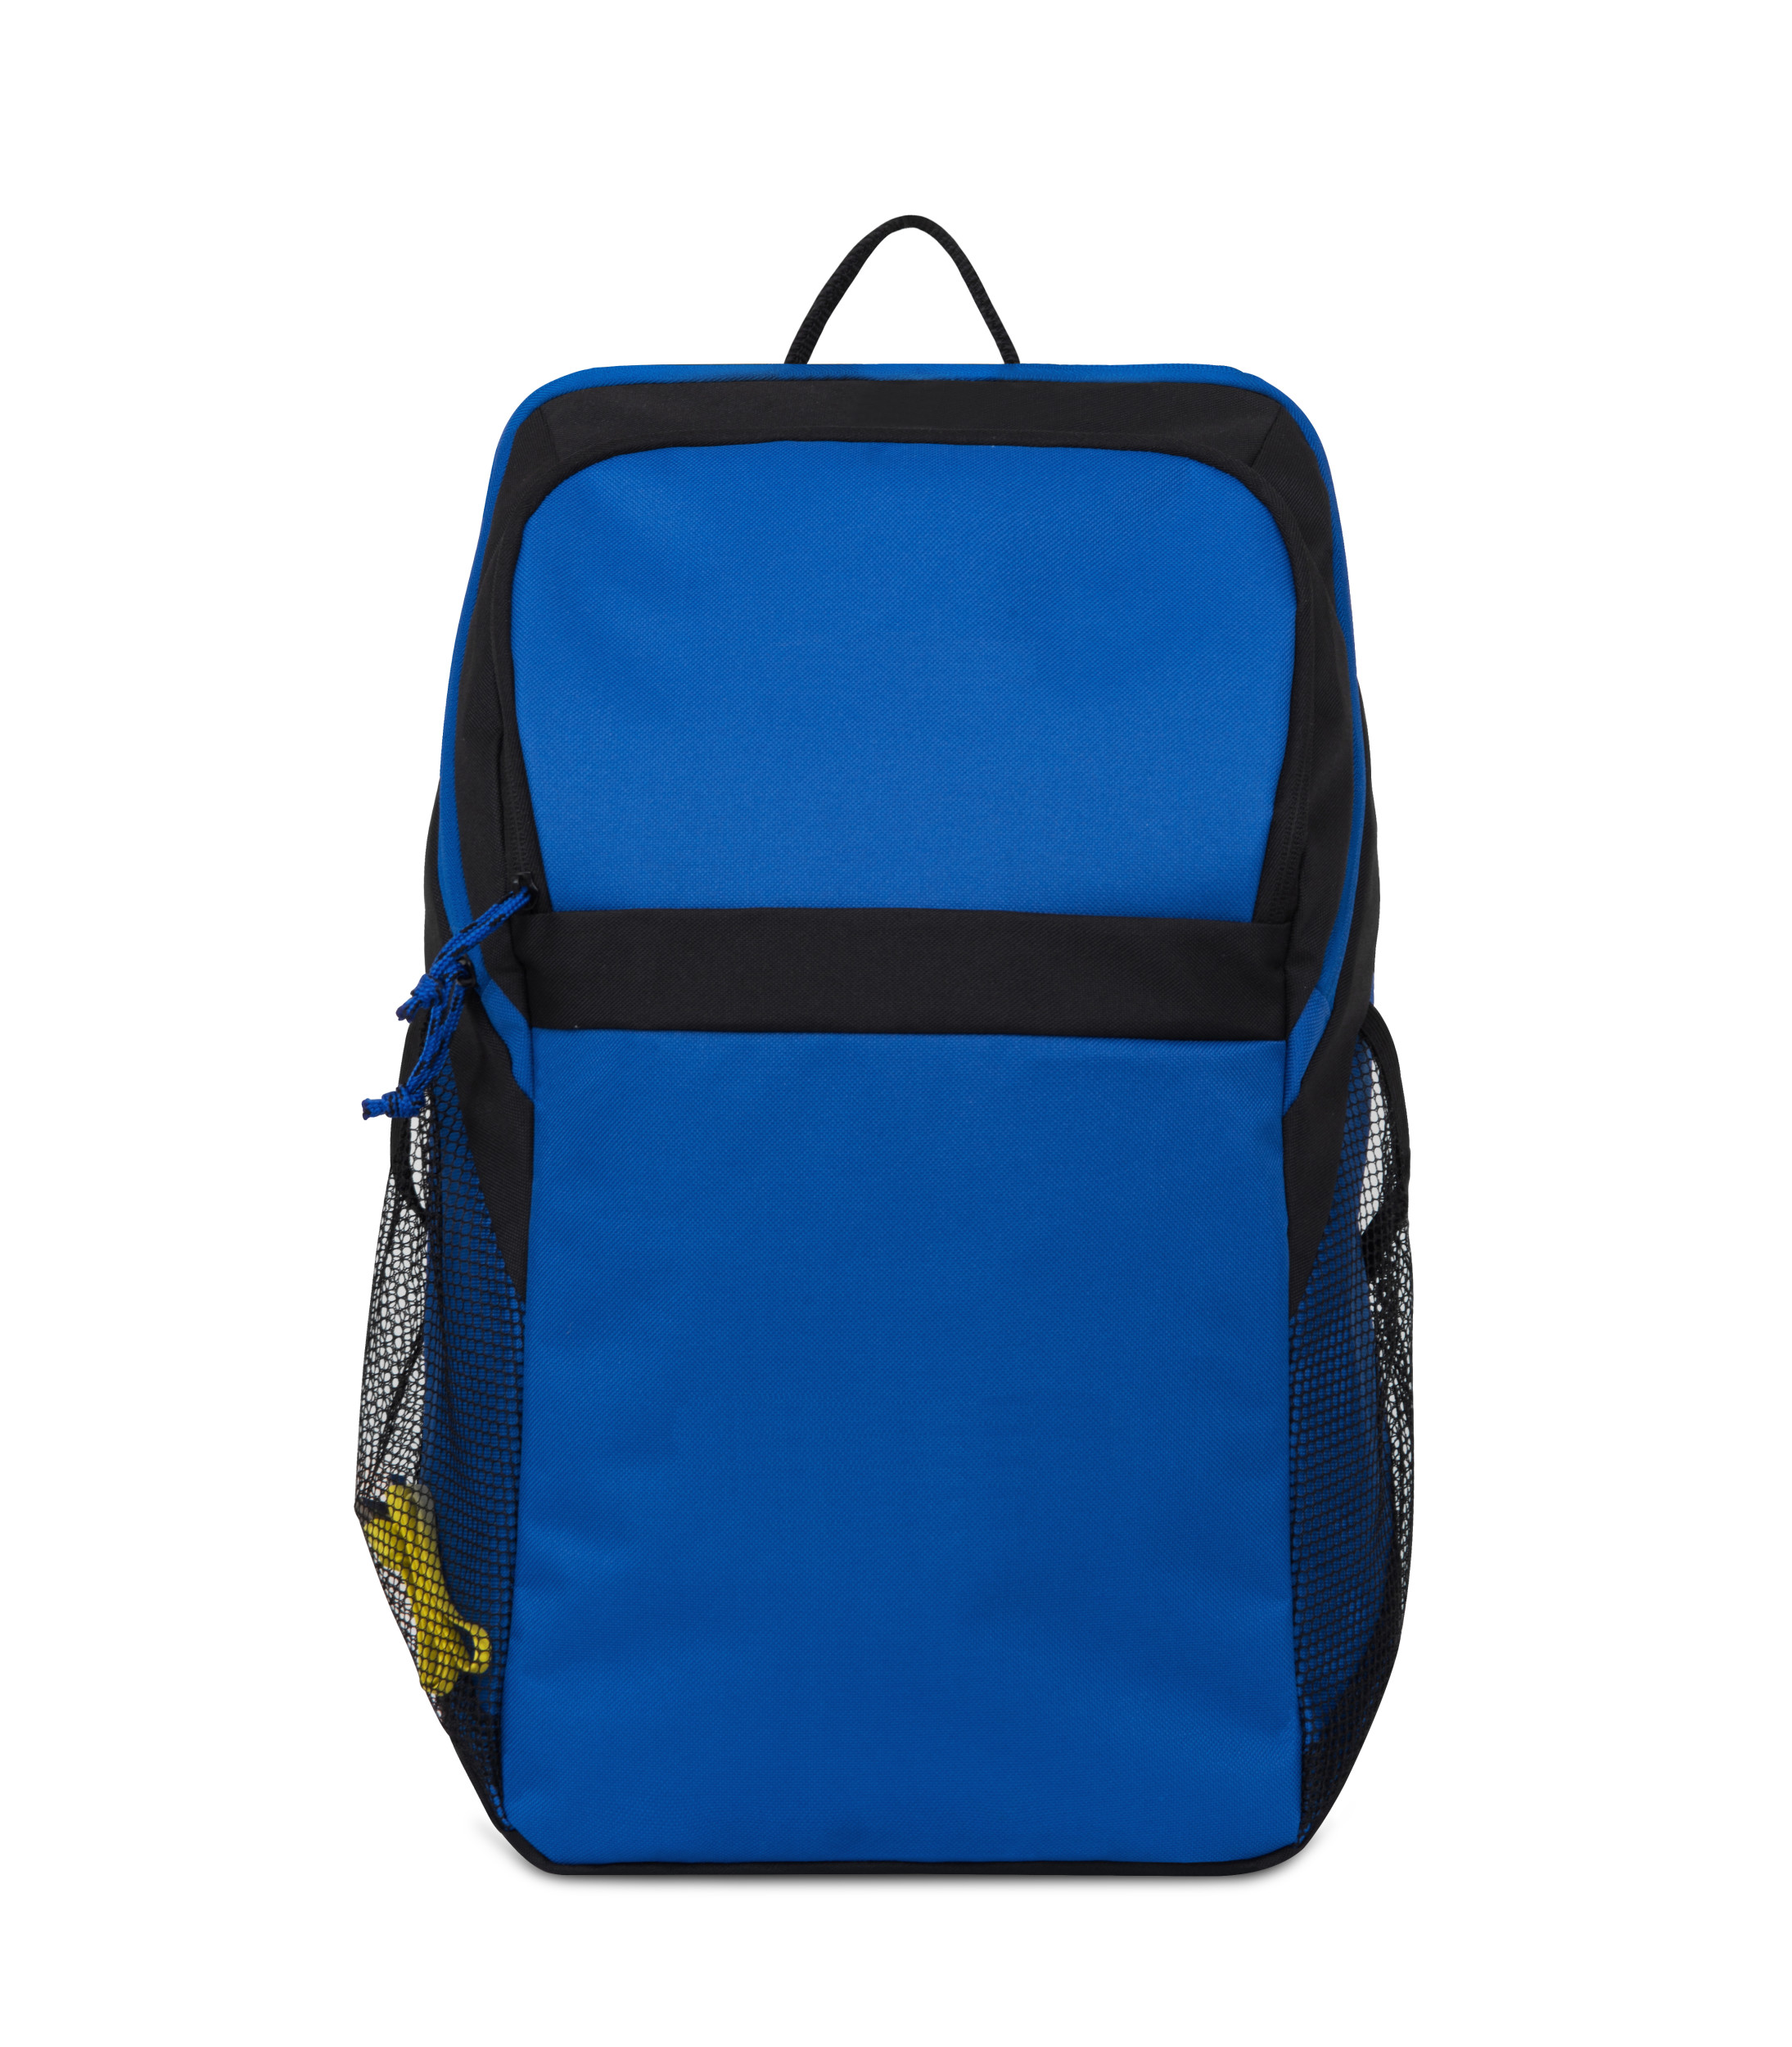 Gemline 5307 - Sycamore Computer Backpack